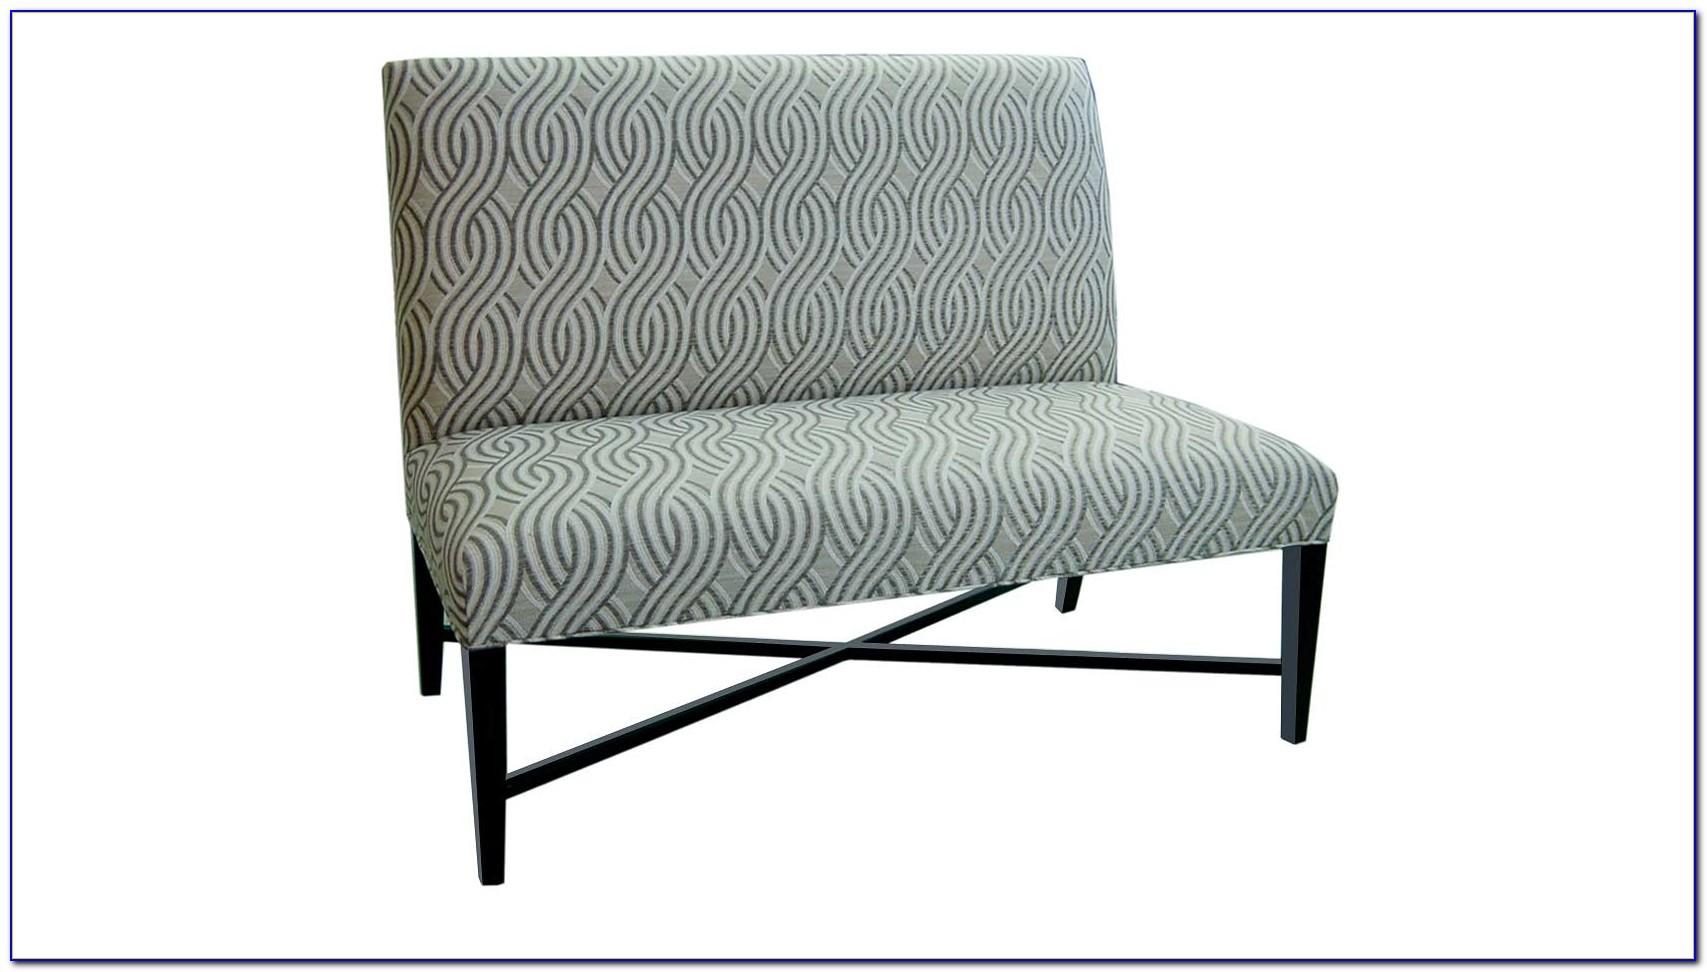 High Back Upholstered Dining Bench